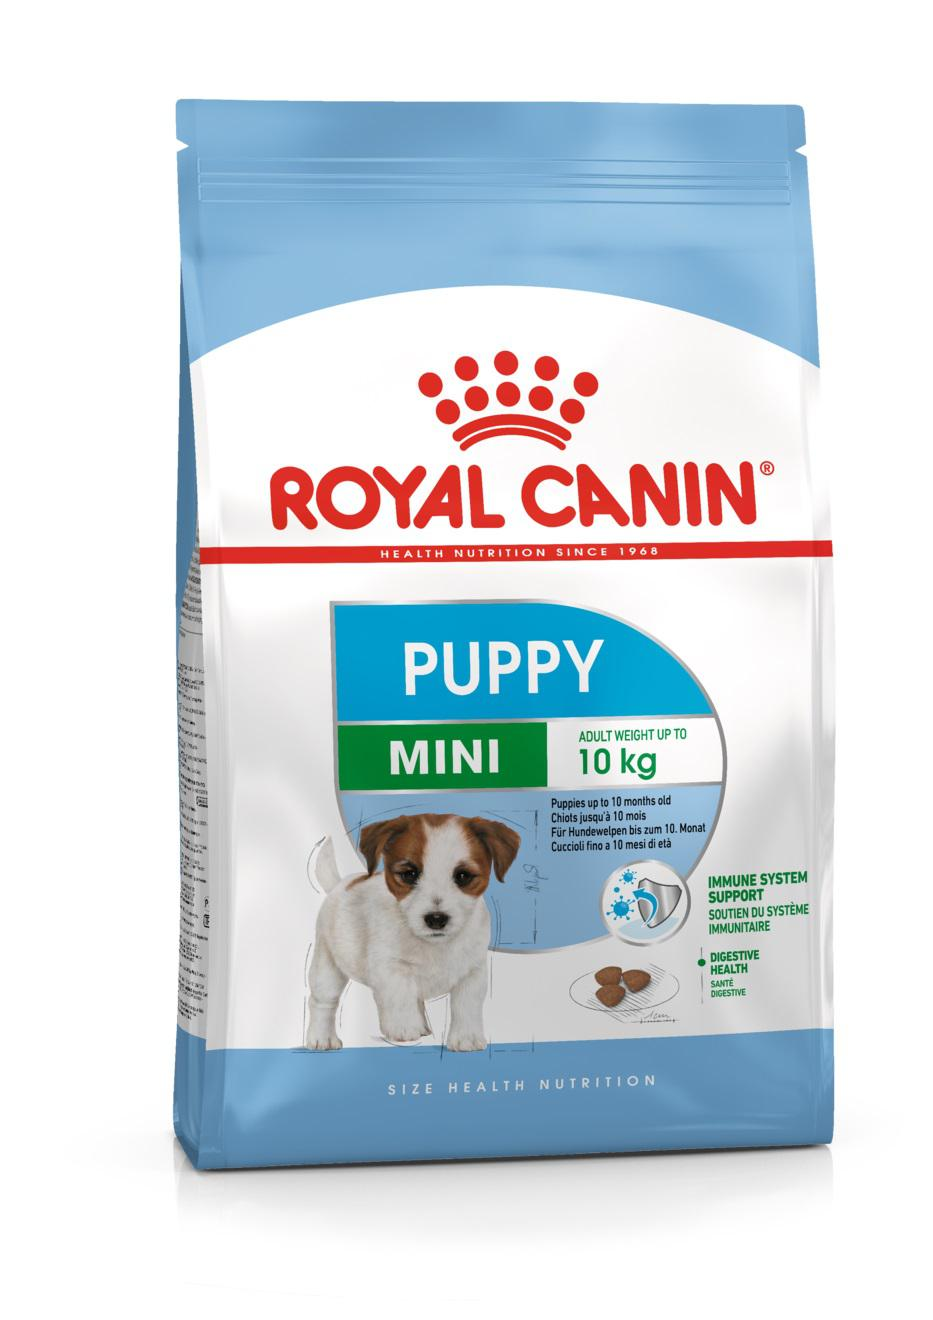 Royal Canin Mini Puppy bal.800g/2,4,8kg - zvìtšit obrázek